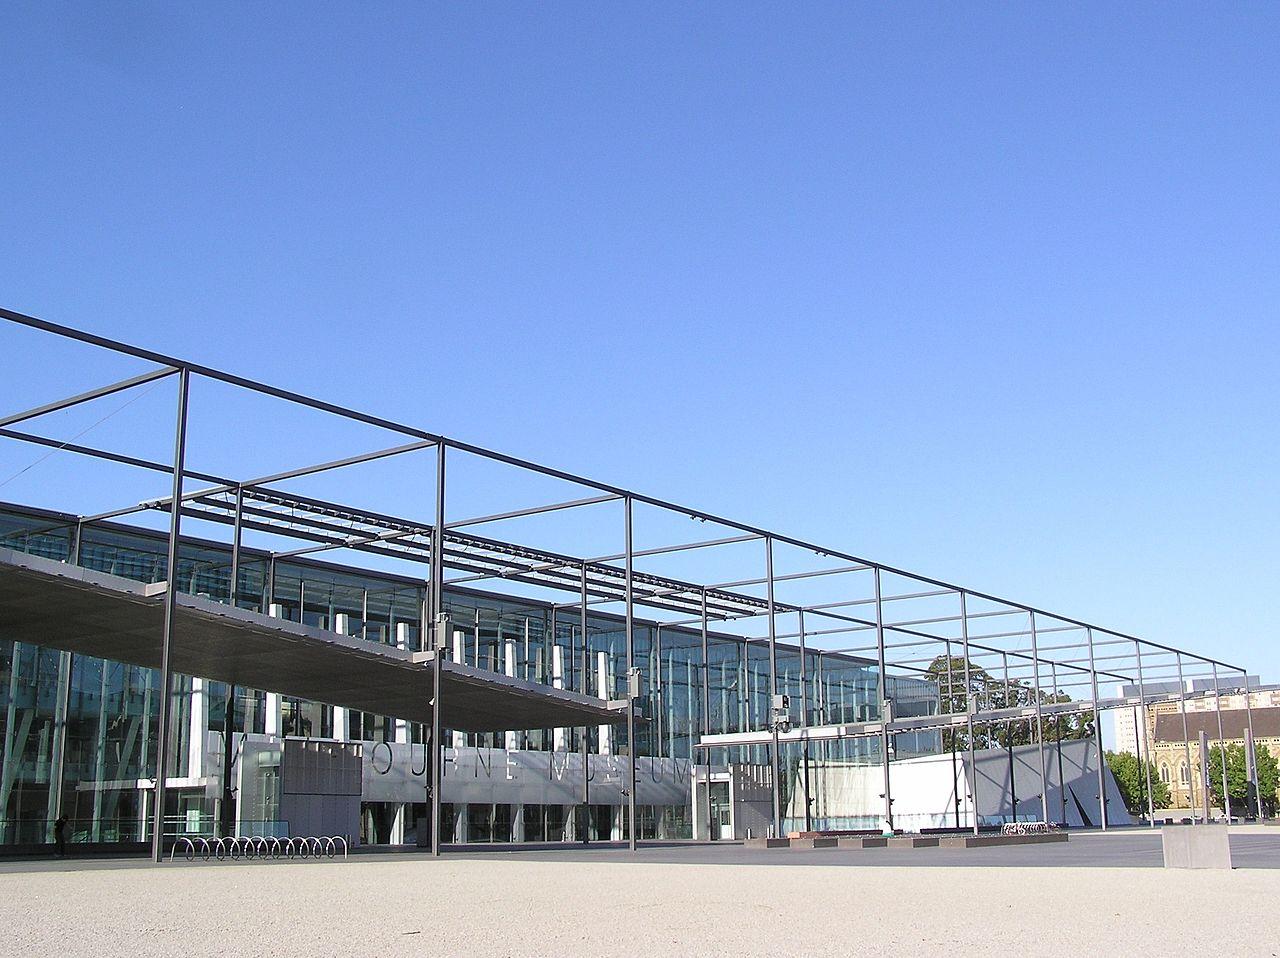 Modern Architecture Melbourne file:melbourne museum (modern architecture) - wikimedia commons